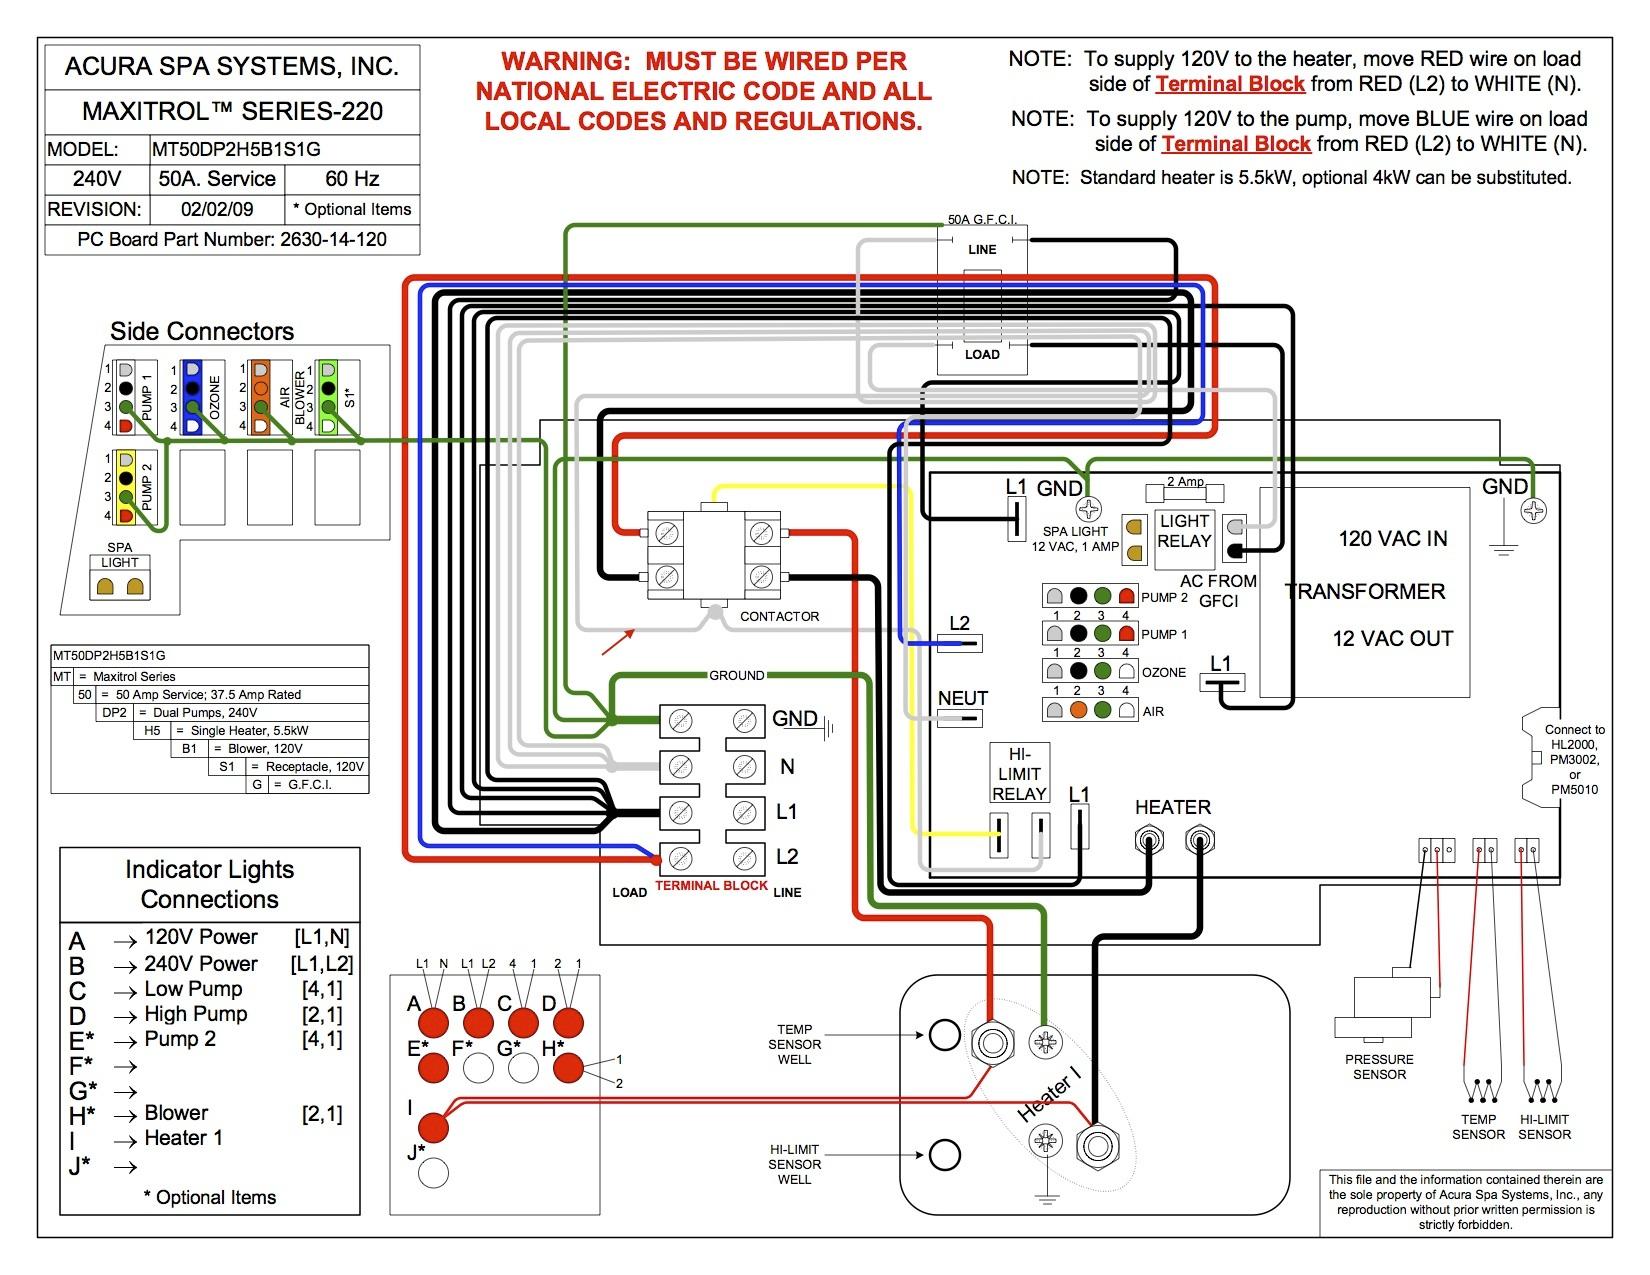 Jacuzzi Wiring Diagram Schemes Century Pool Pump Motor Diagrams Acura Spa Systems Books Of U2022 Tub